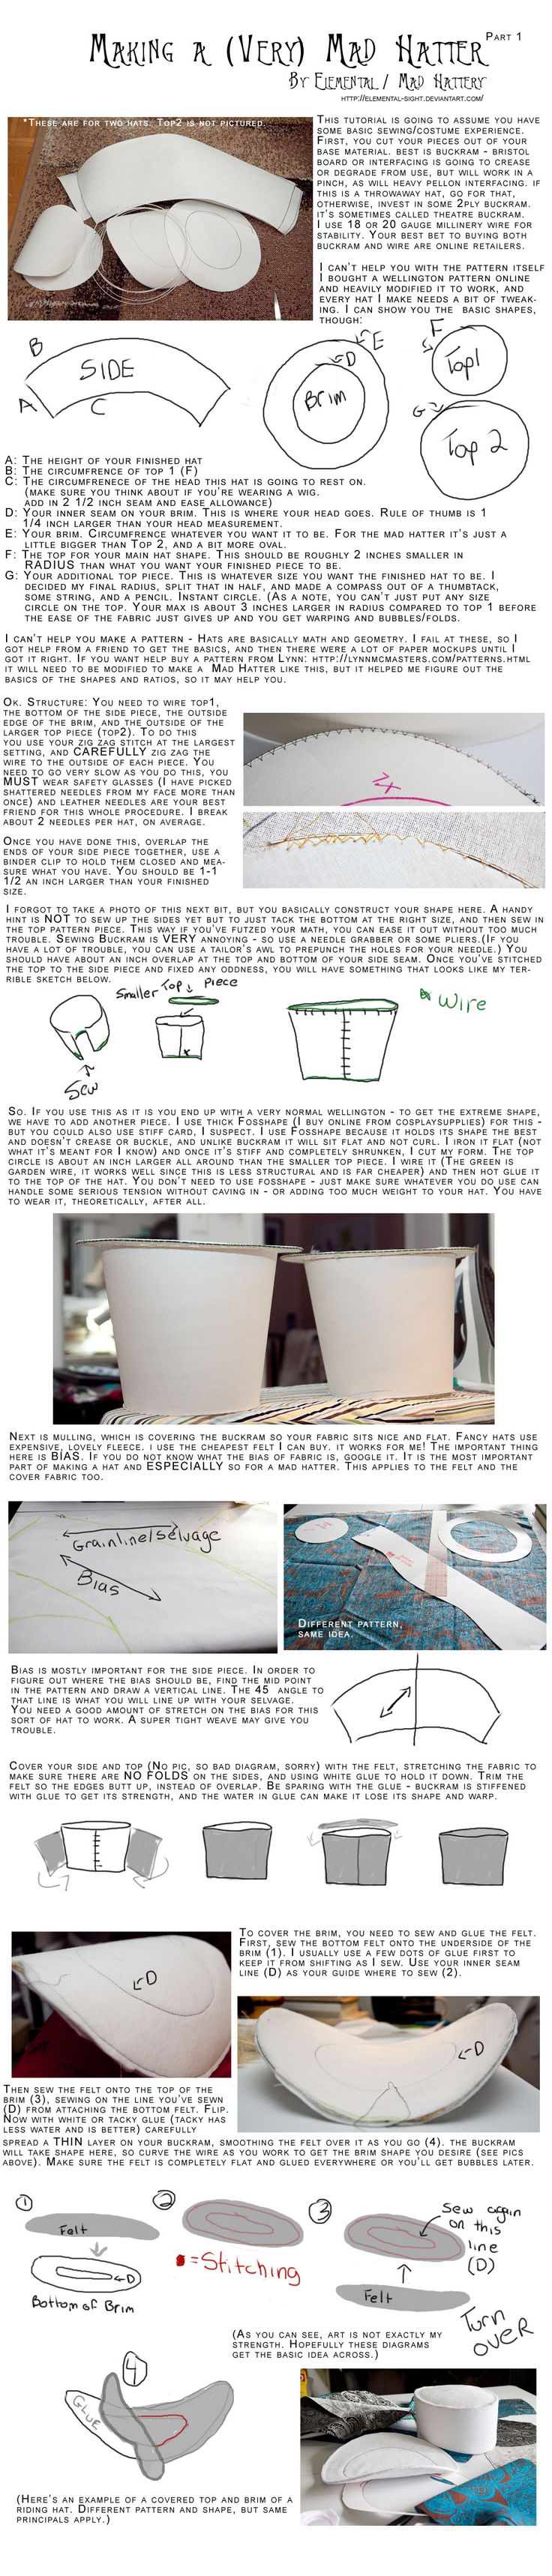 How to Make a Mad Hatter Part 1 by Elemental-Sight.deviantart.com on @deviantART